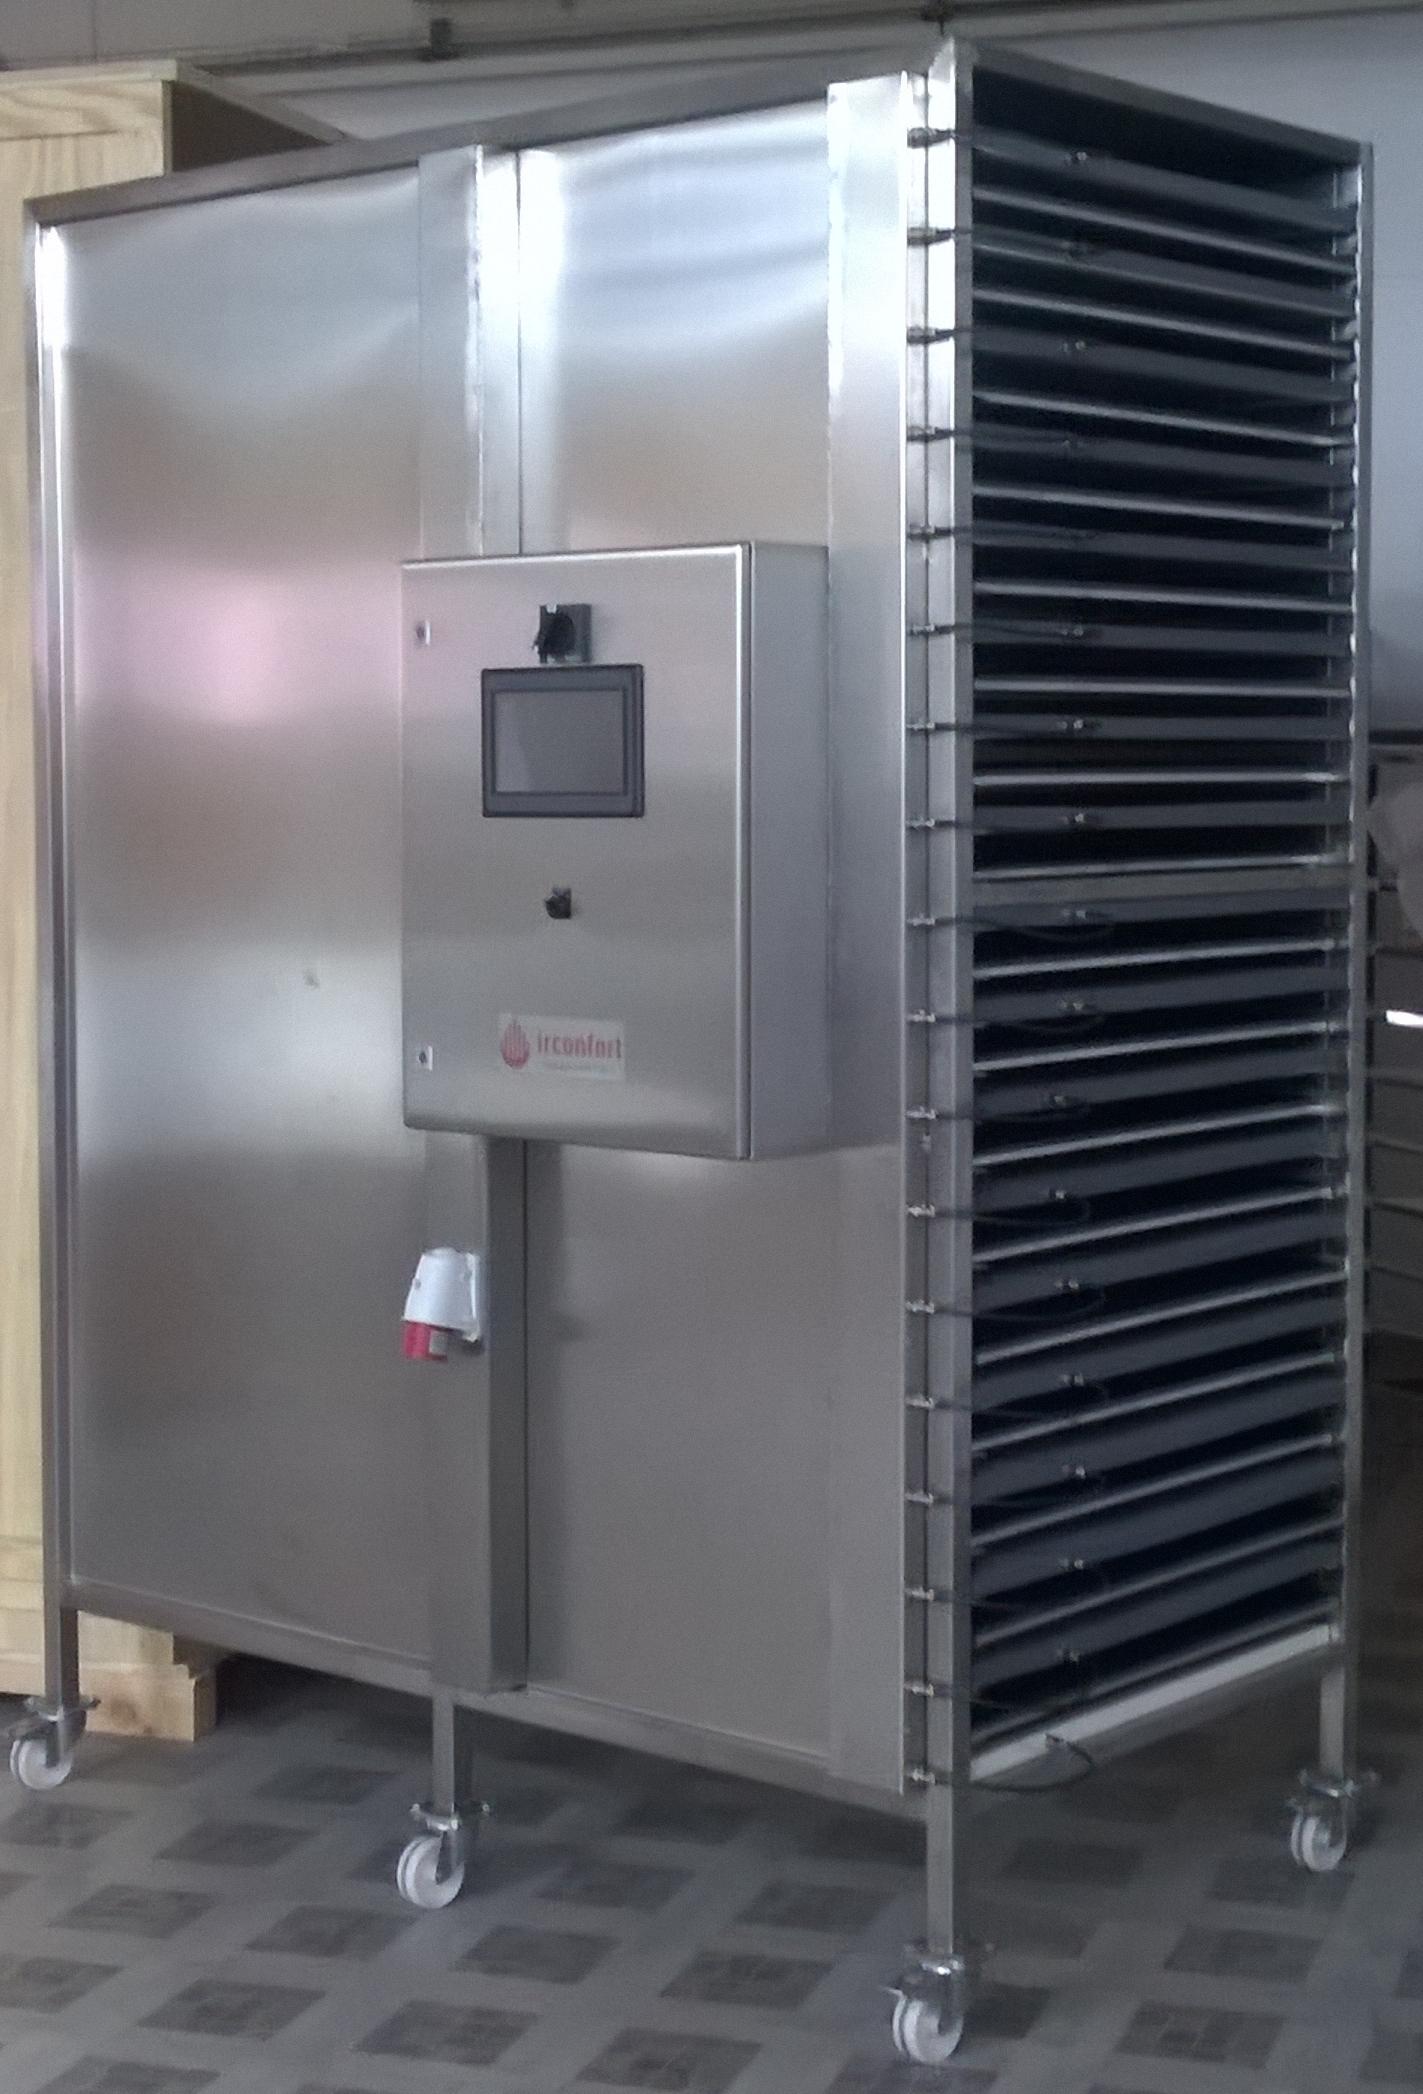 irconfort-deshidratadoras-alimentos